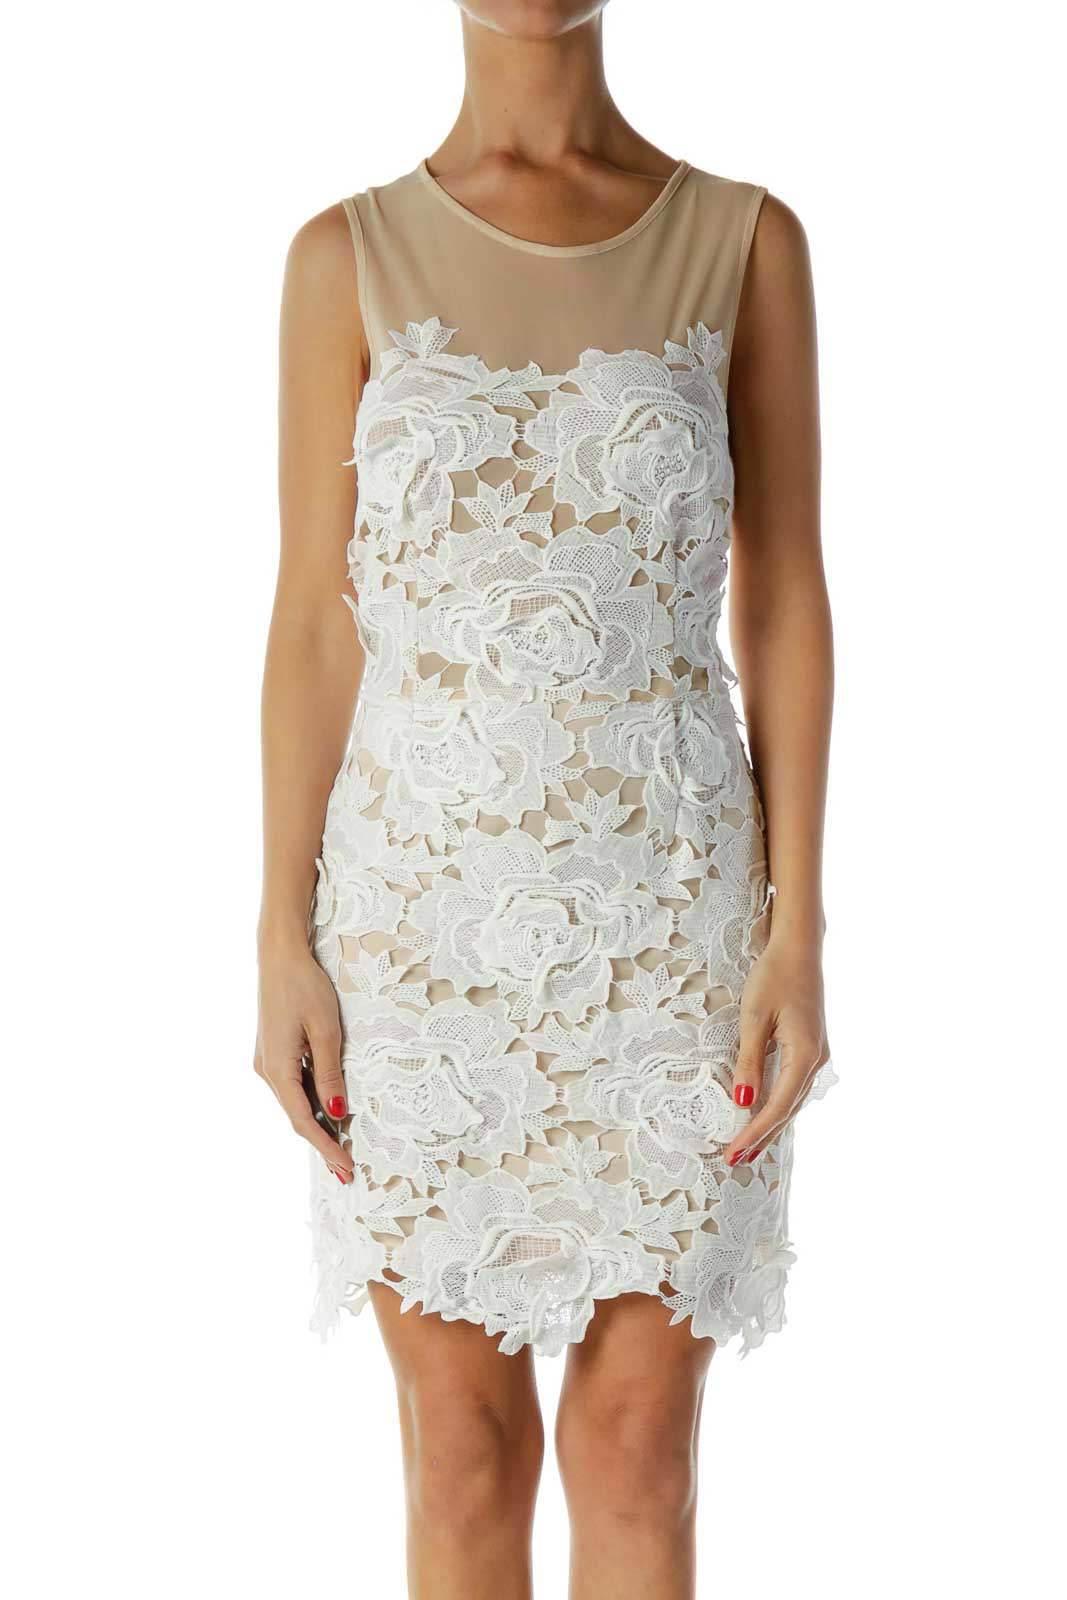 White Beige Lace Dress Front